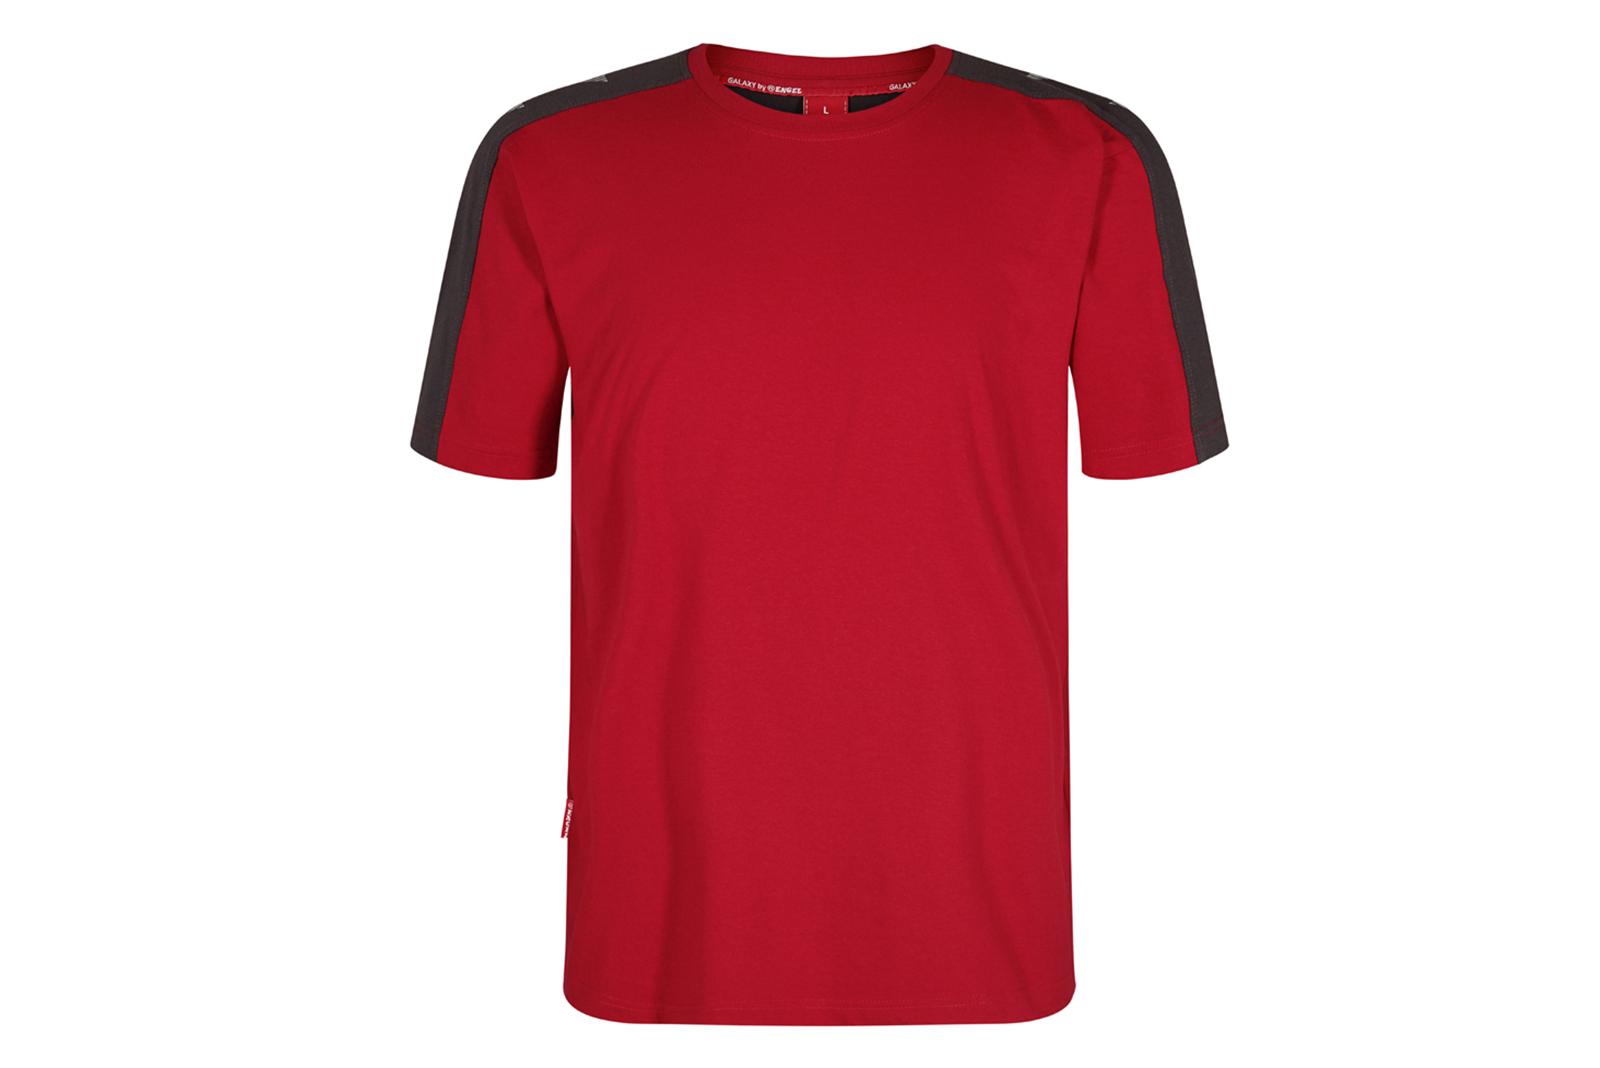 Win a Galaxy t-shirt